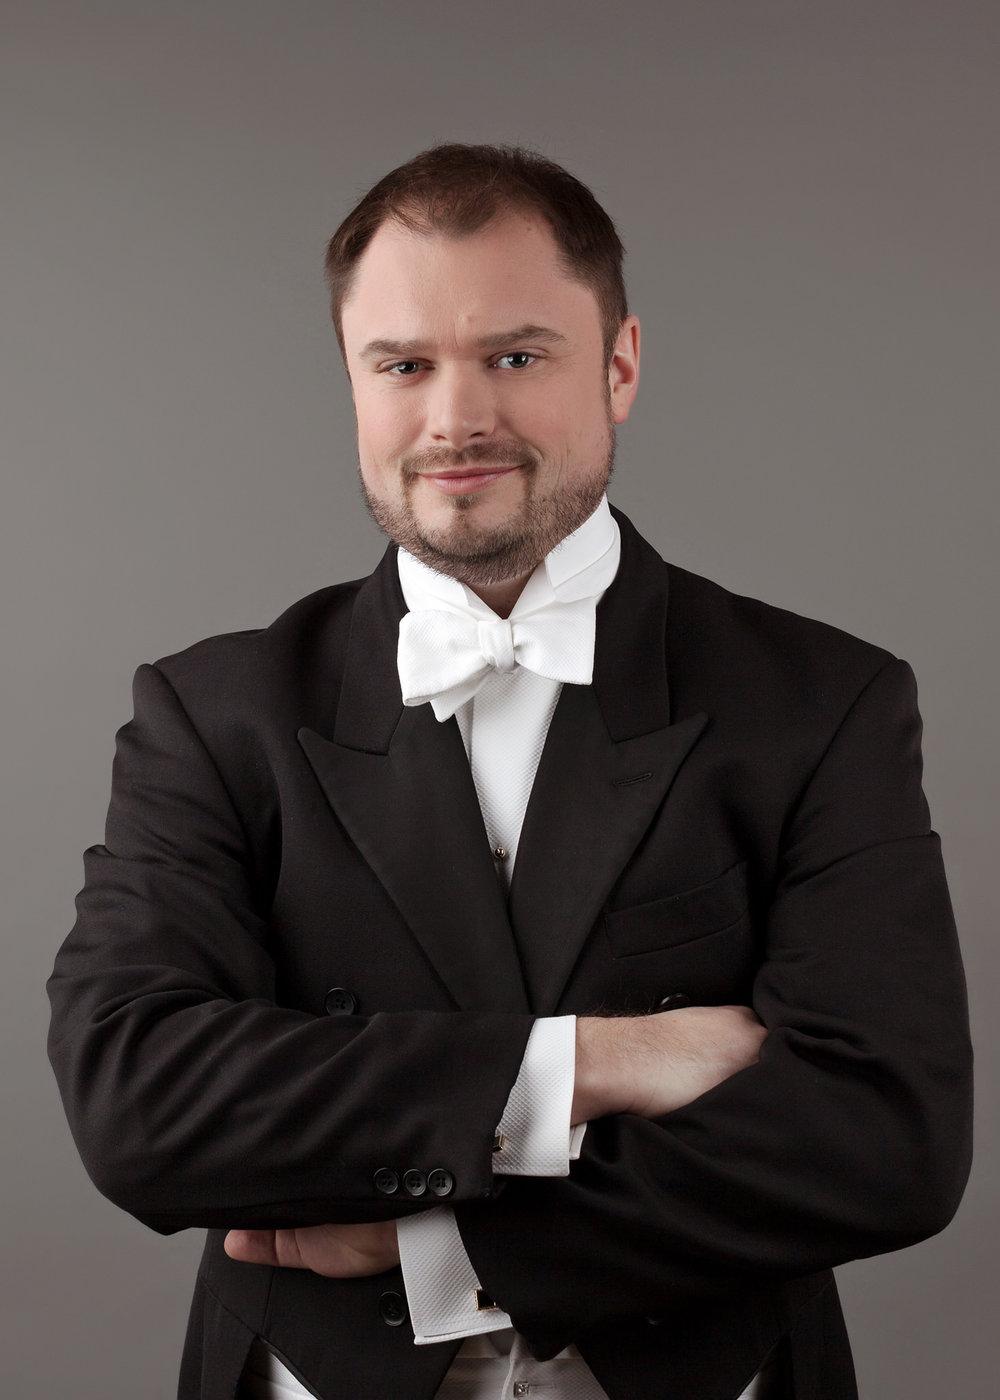 Alexander Edwards headshot opera singer.